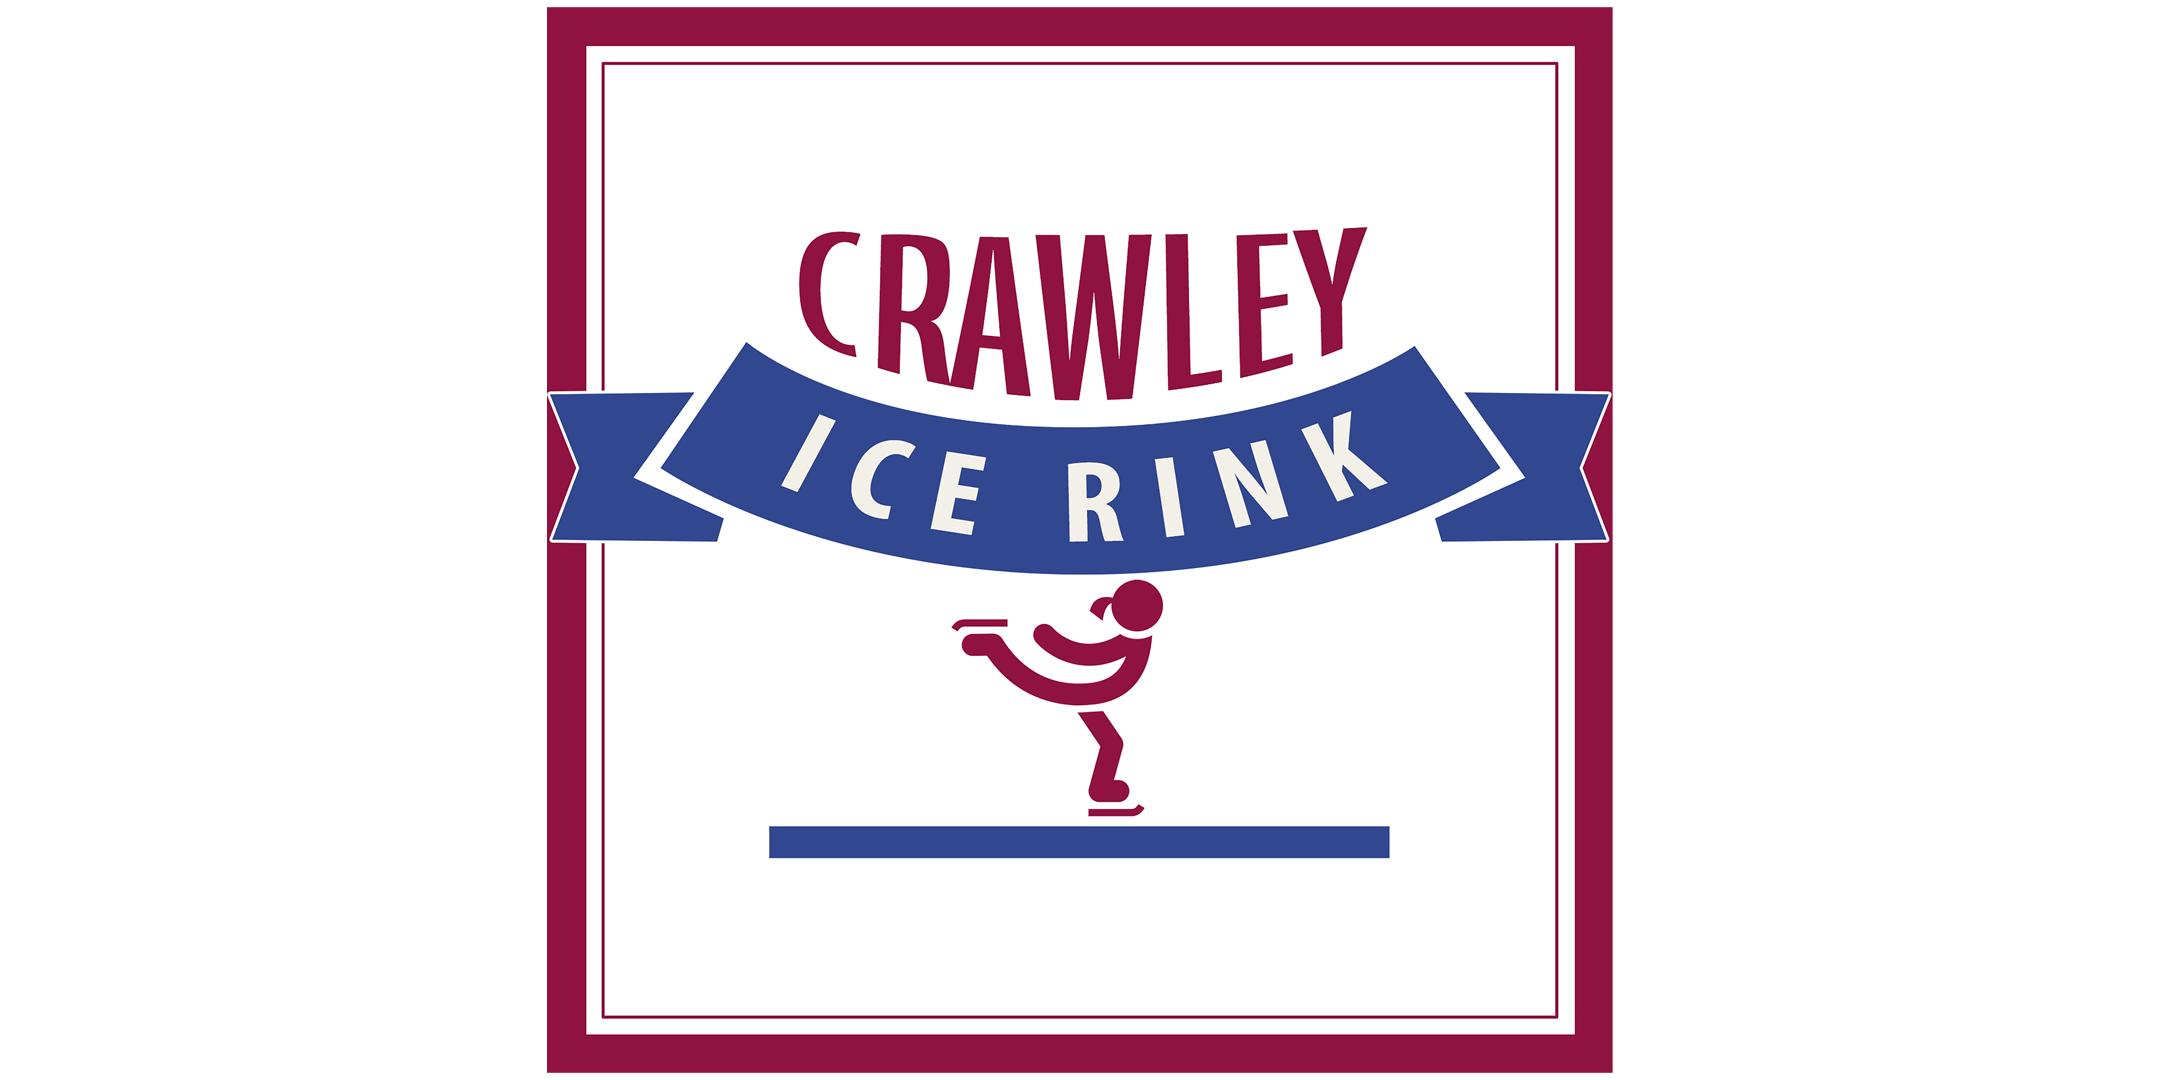 Crawley Ice Rink - 14th December (Off Peak)